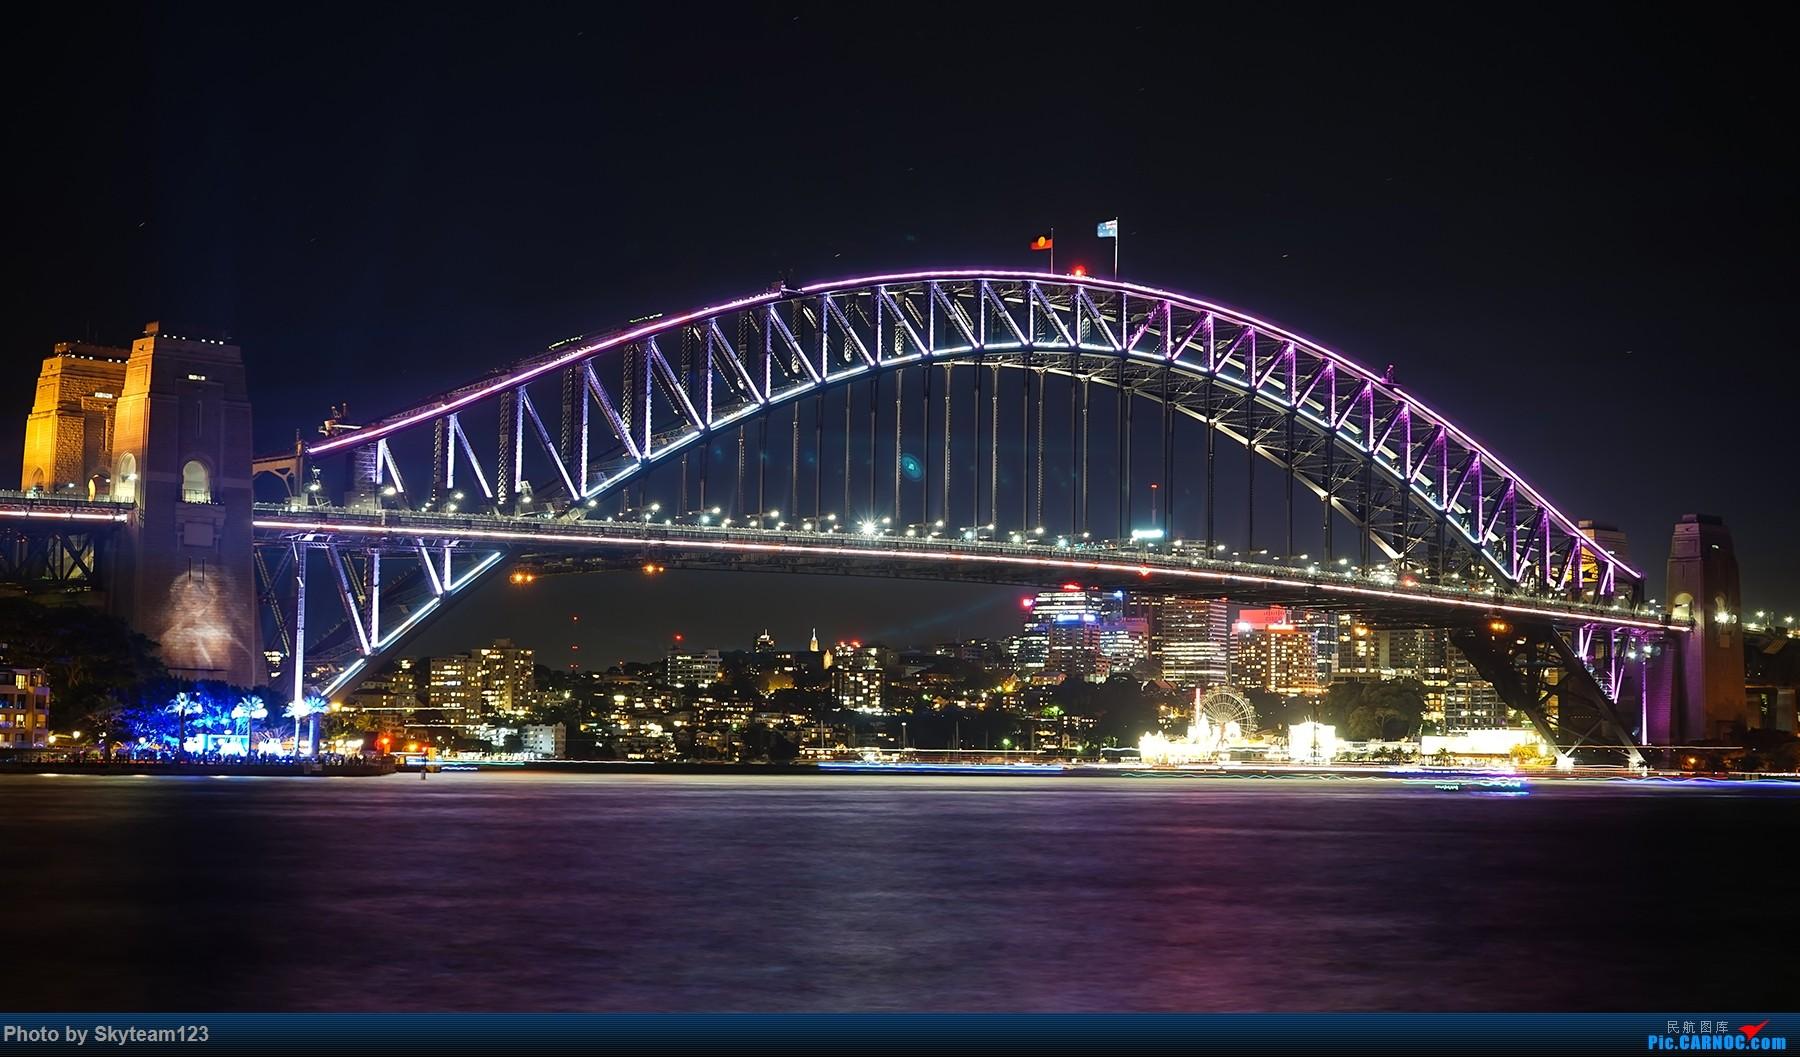 Re:[原创]SYD 杂图几张 T2航站楼 AIRBUS A330-300 B-18361 澳大利亚悉尼金斯福德·史密斯机场